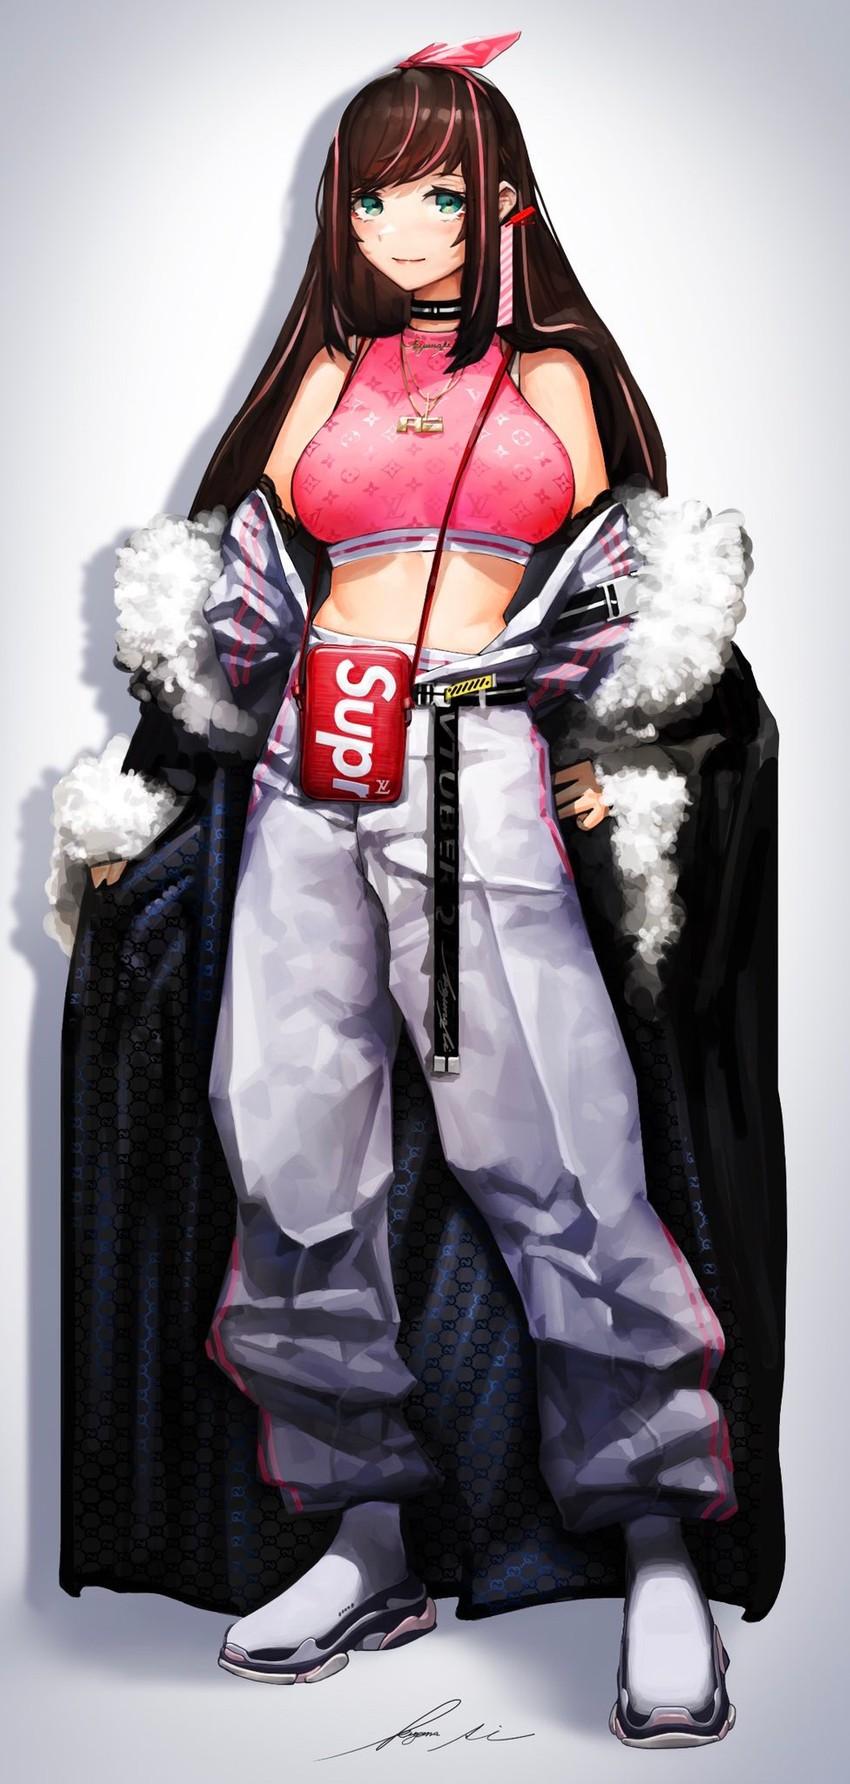 kizuna ai (a.i. channel and etc) drawn by ryoga